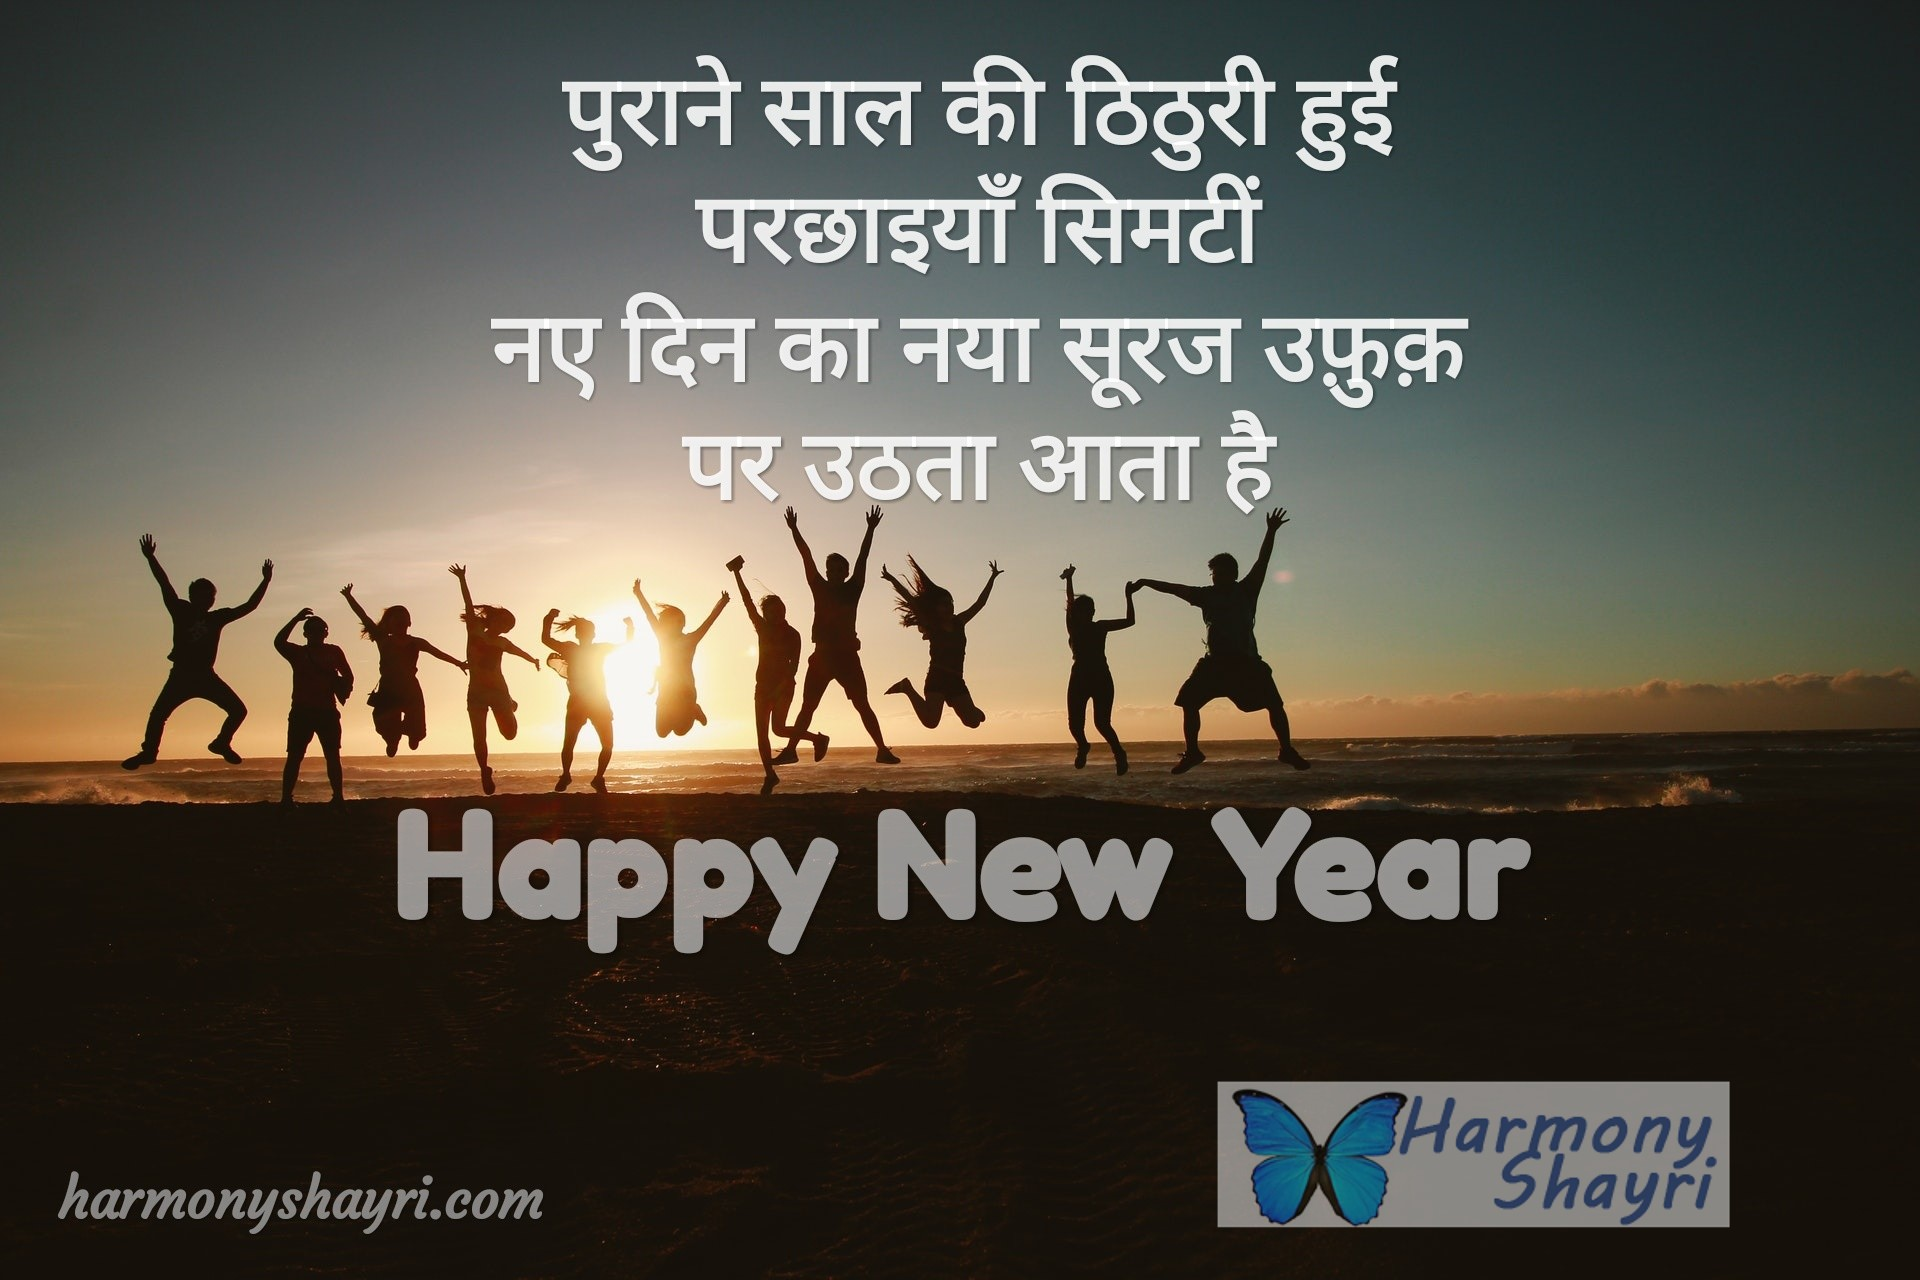 Happy New Year Ki Shayari 69